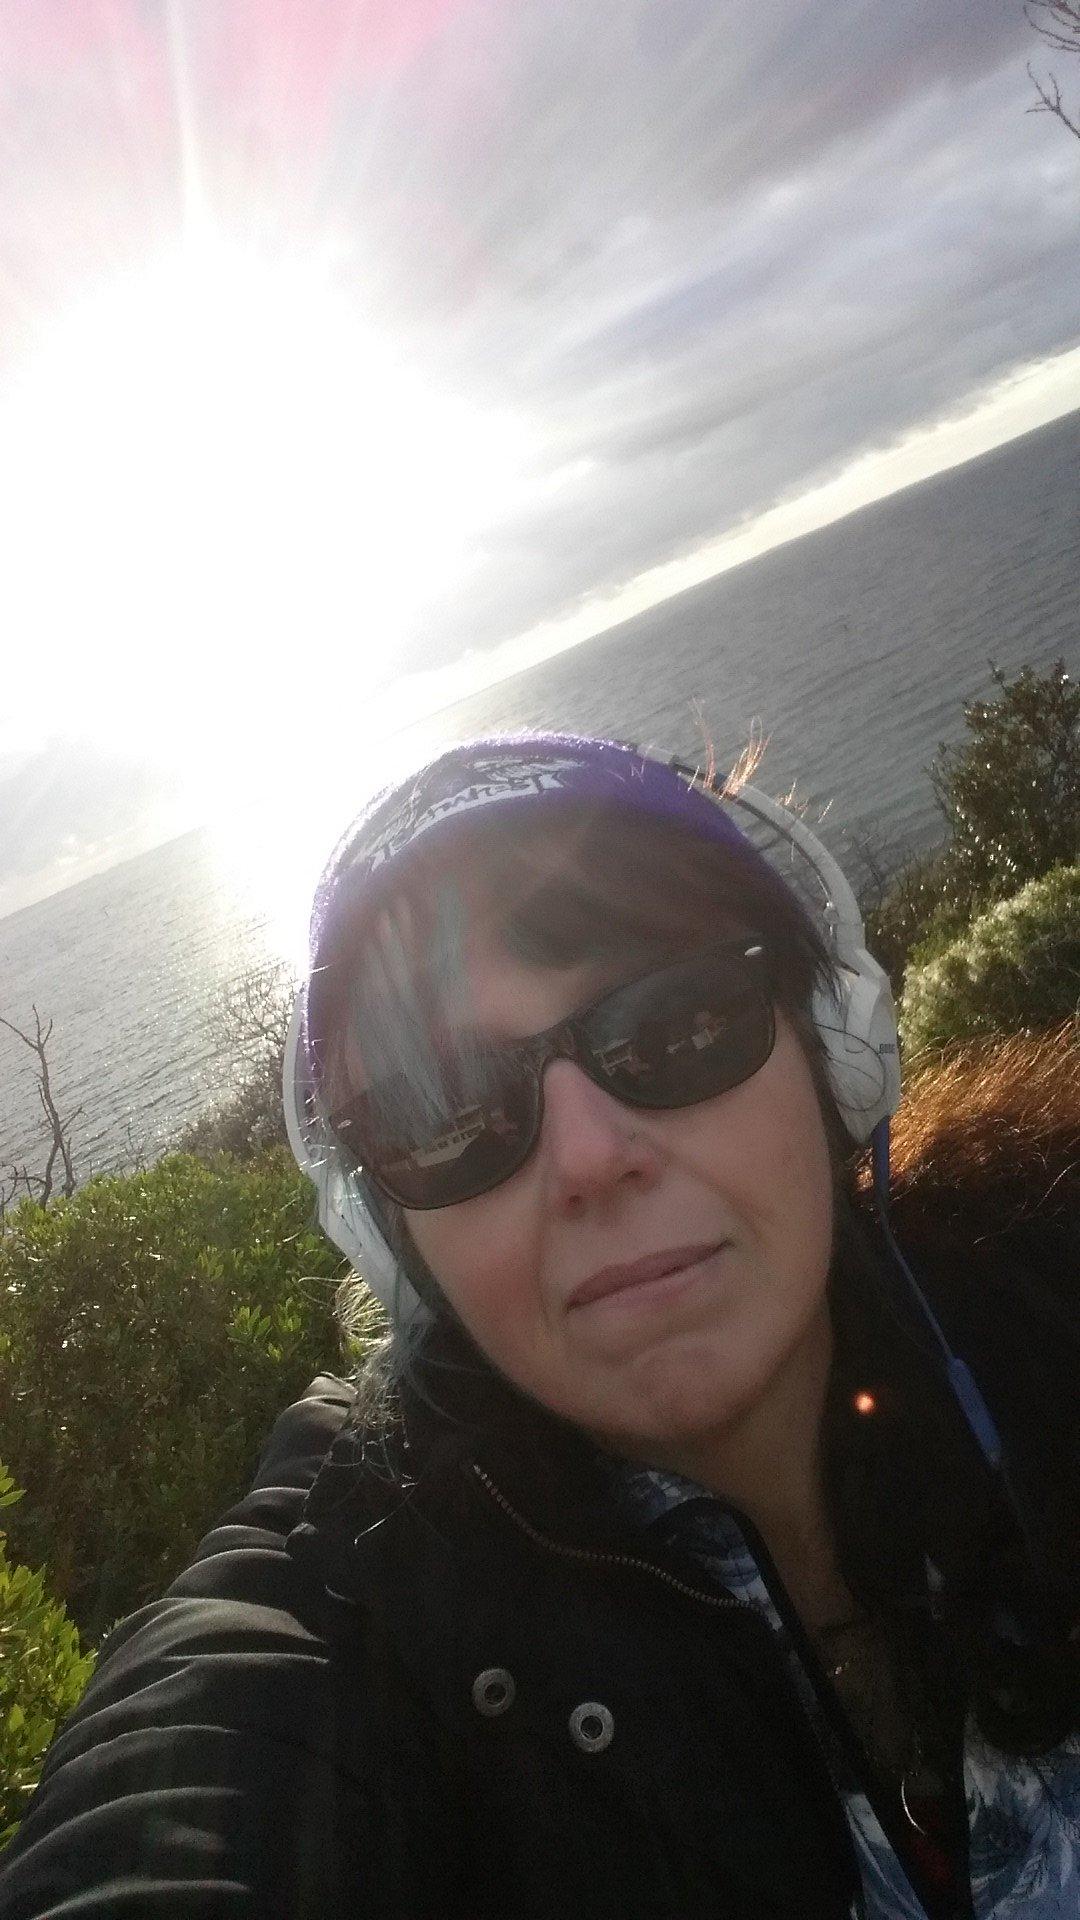 5+km, 68mins later (hey, I was walking & reading & listening at same time ☺) #stepsforkindness done! @RandomActsOrg @mishacollins https://t.co/MgYtoZeCHN